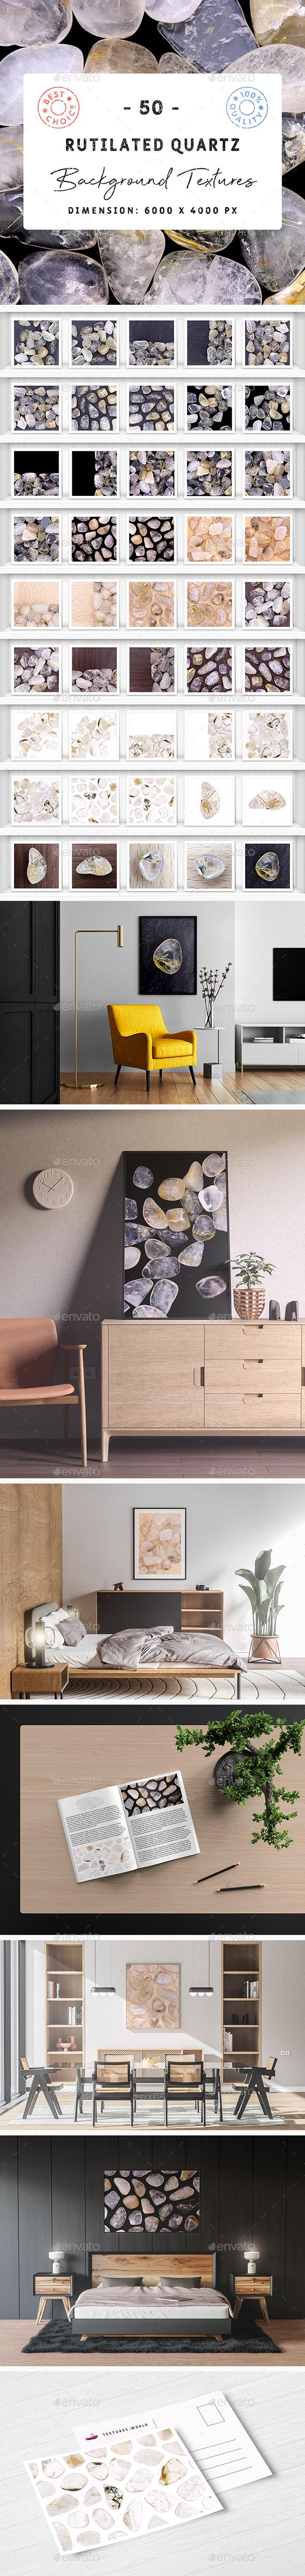 50 Rutilated Quartz Background Textures